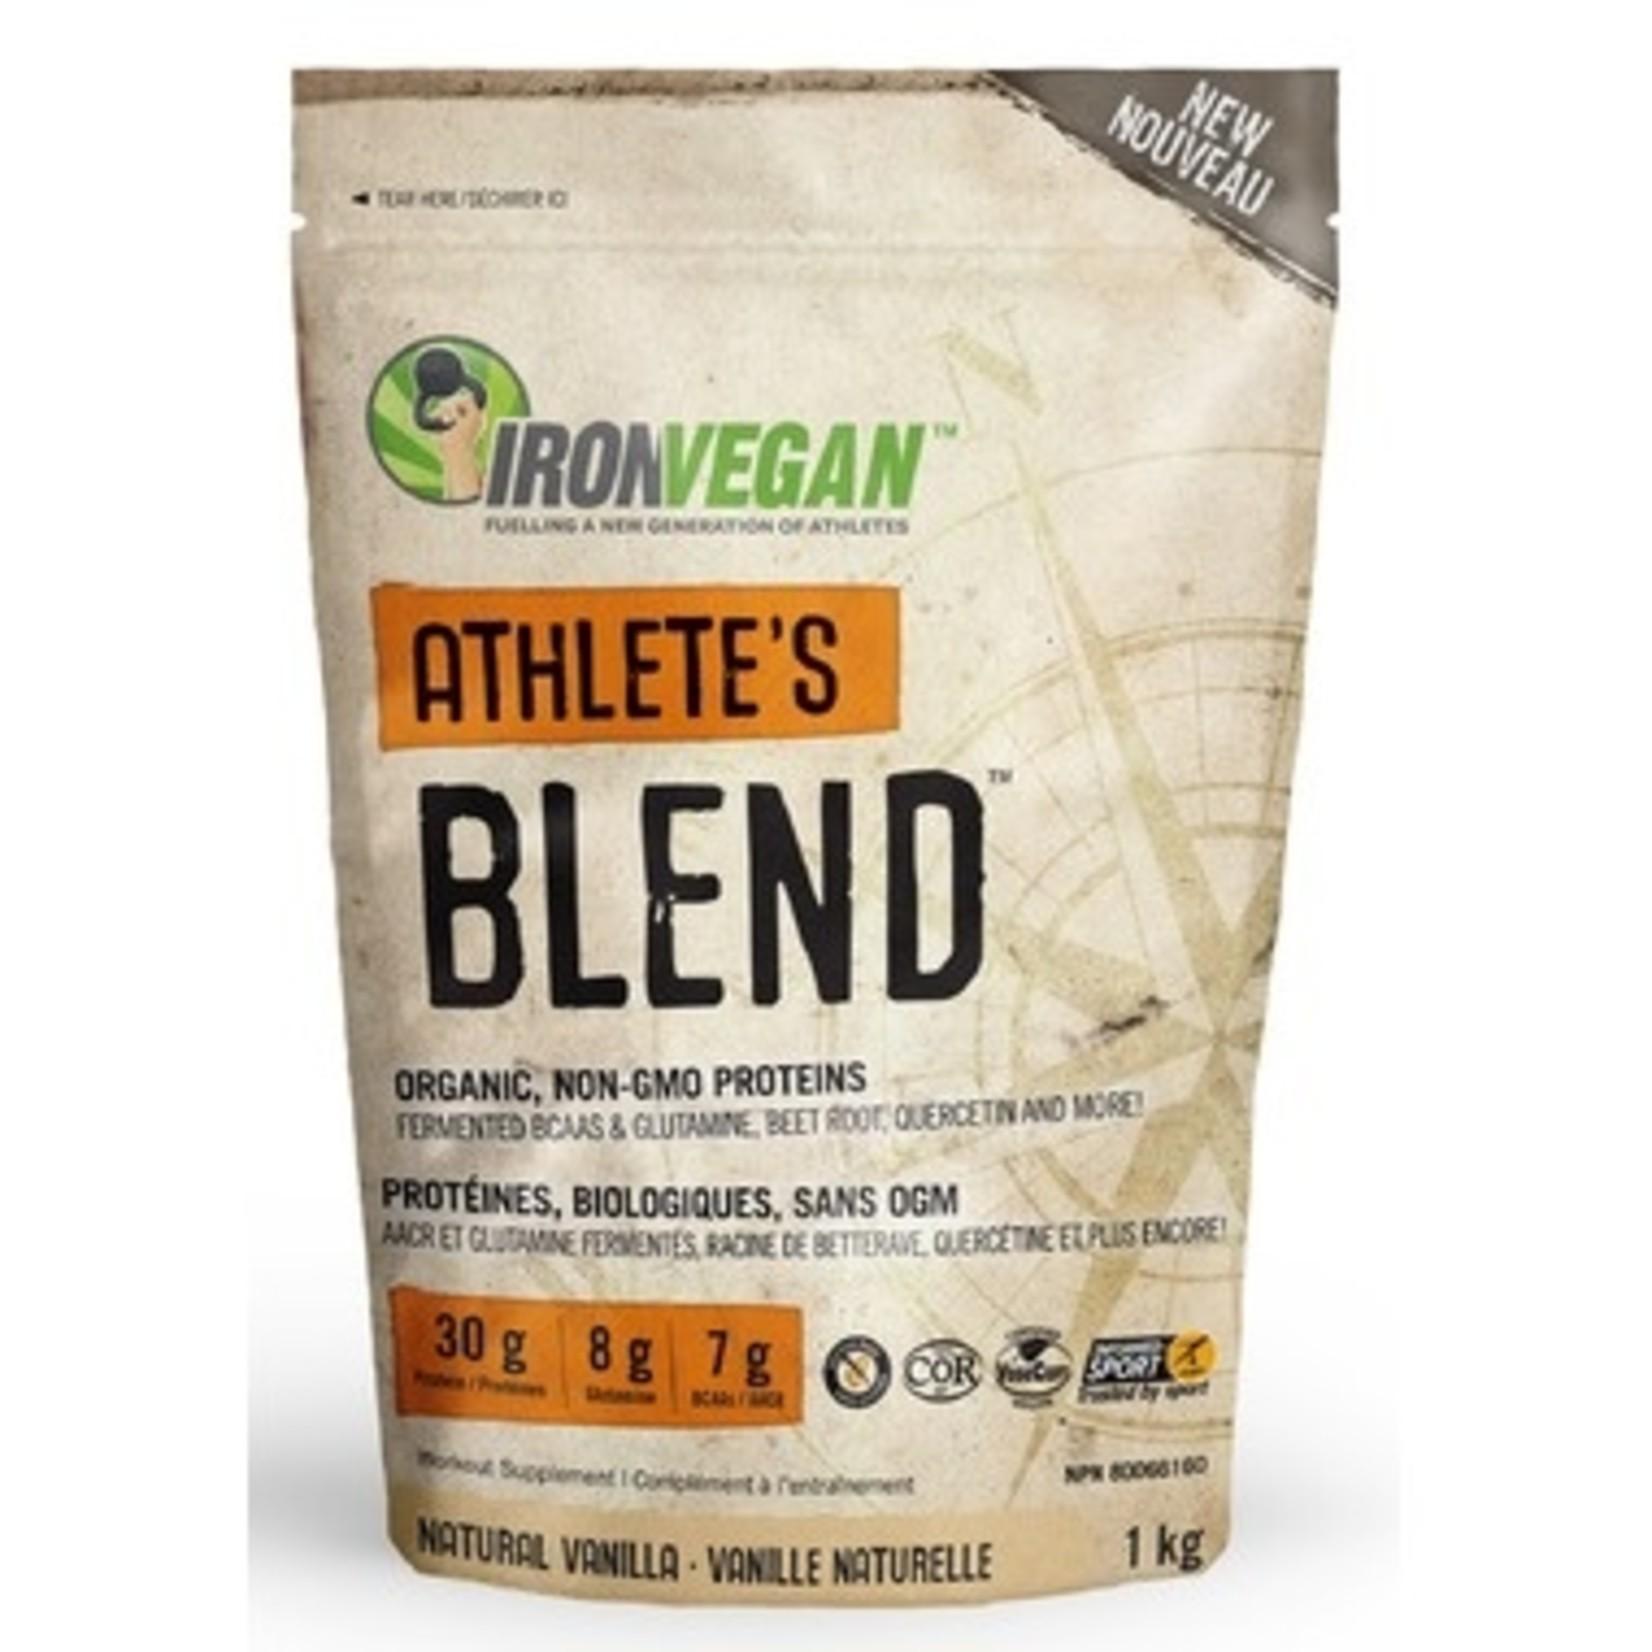 Iron Vegan Iron Vegan Athlete's Blend Natural Vanilla 1kg